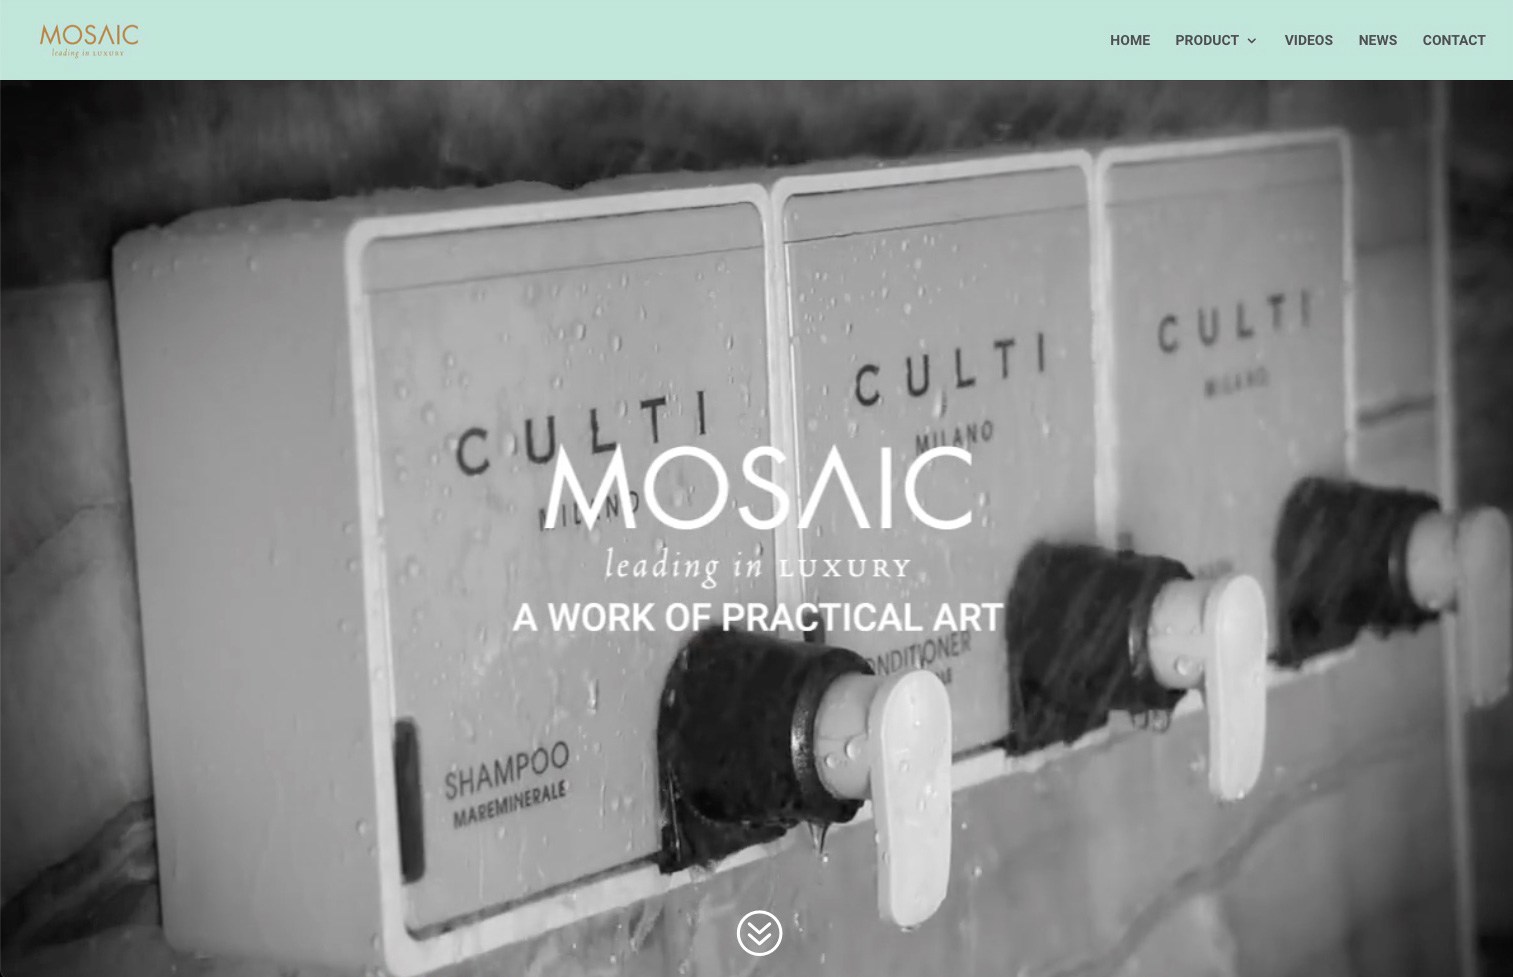 image of homepage for mosaicdispenser.com